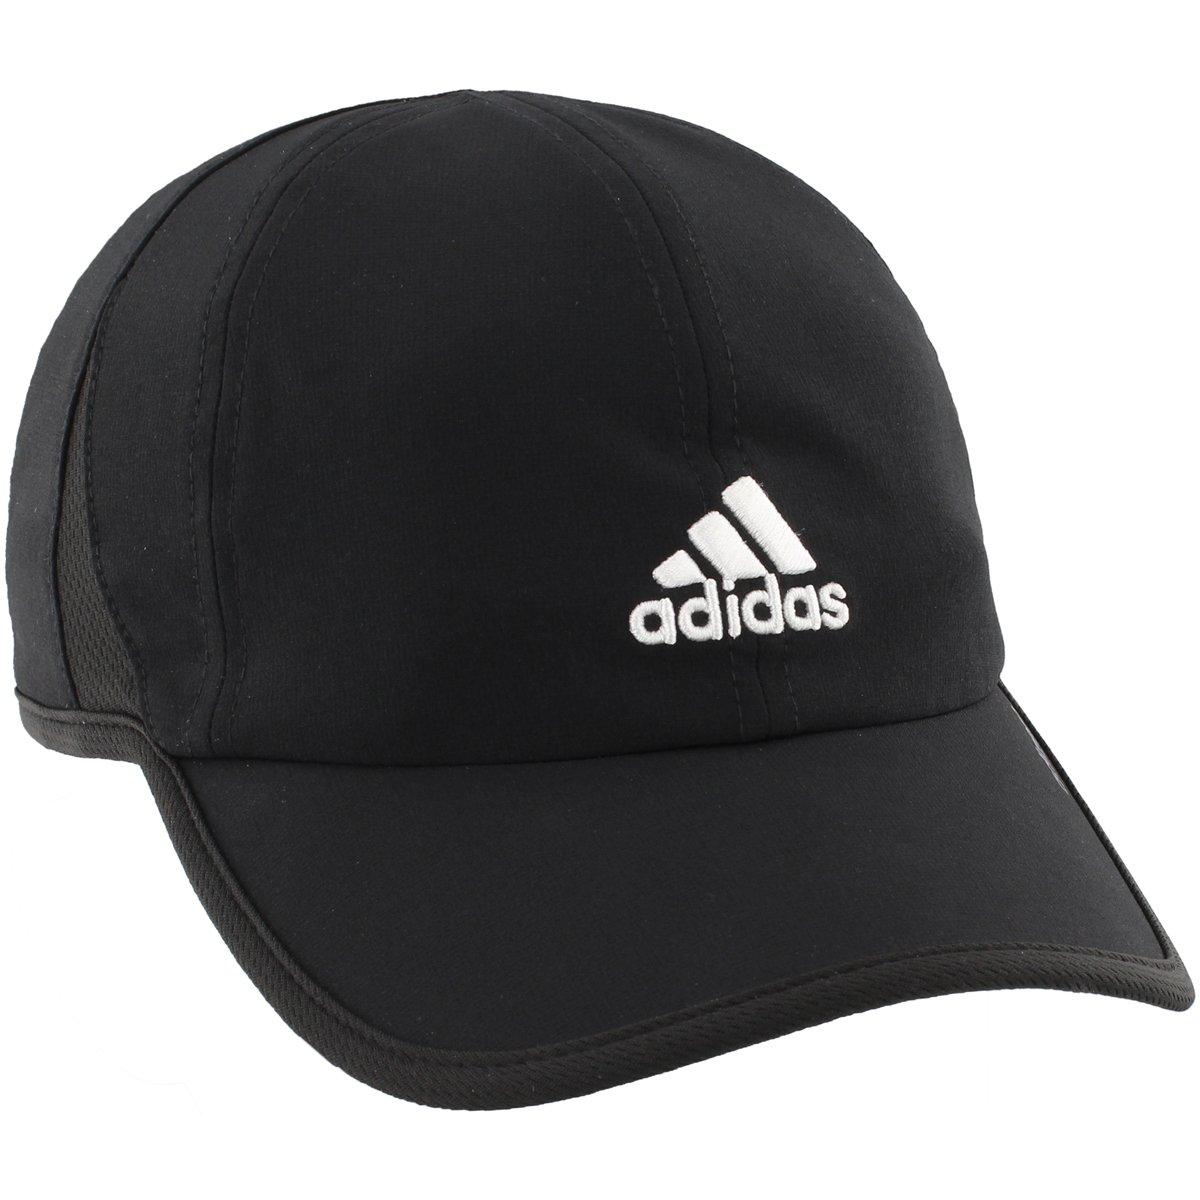 timeless design 0661b 696bf Amazon.com  adidas Men s Adizero II Cap, Black White, One Size  Clothing